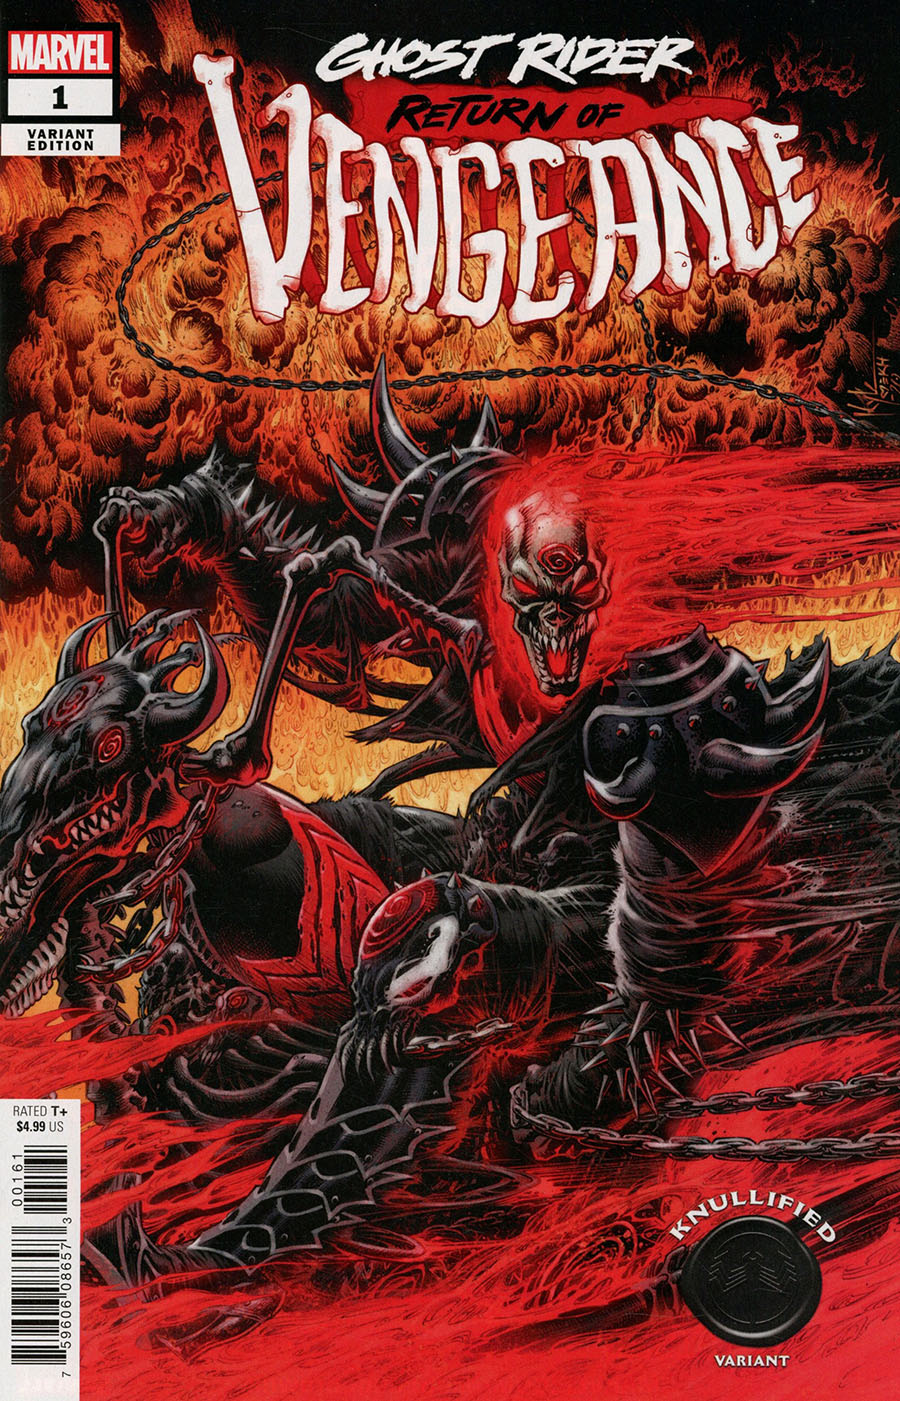 Ghost Rider Return Of Vengeance One Shot Cover B Variant Kyle Hotz Knullified Cover